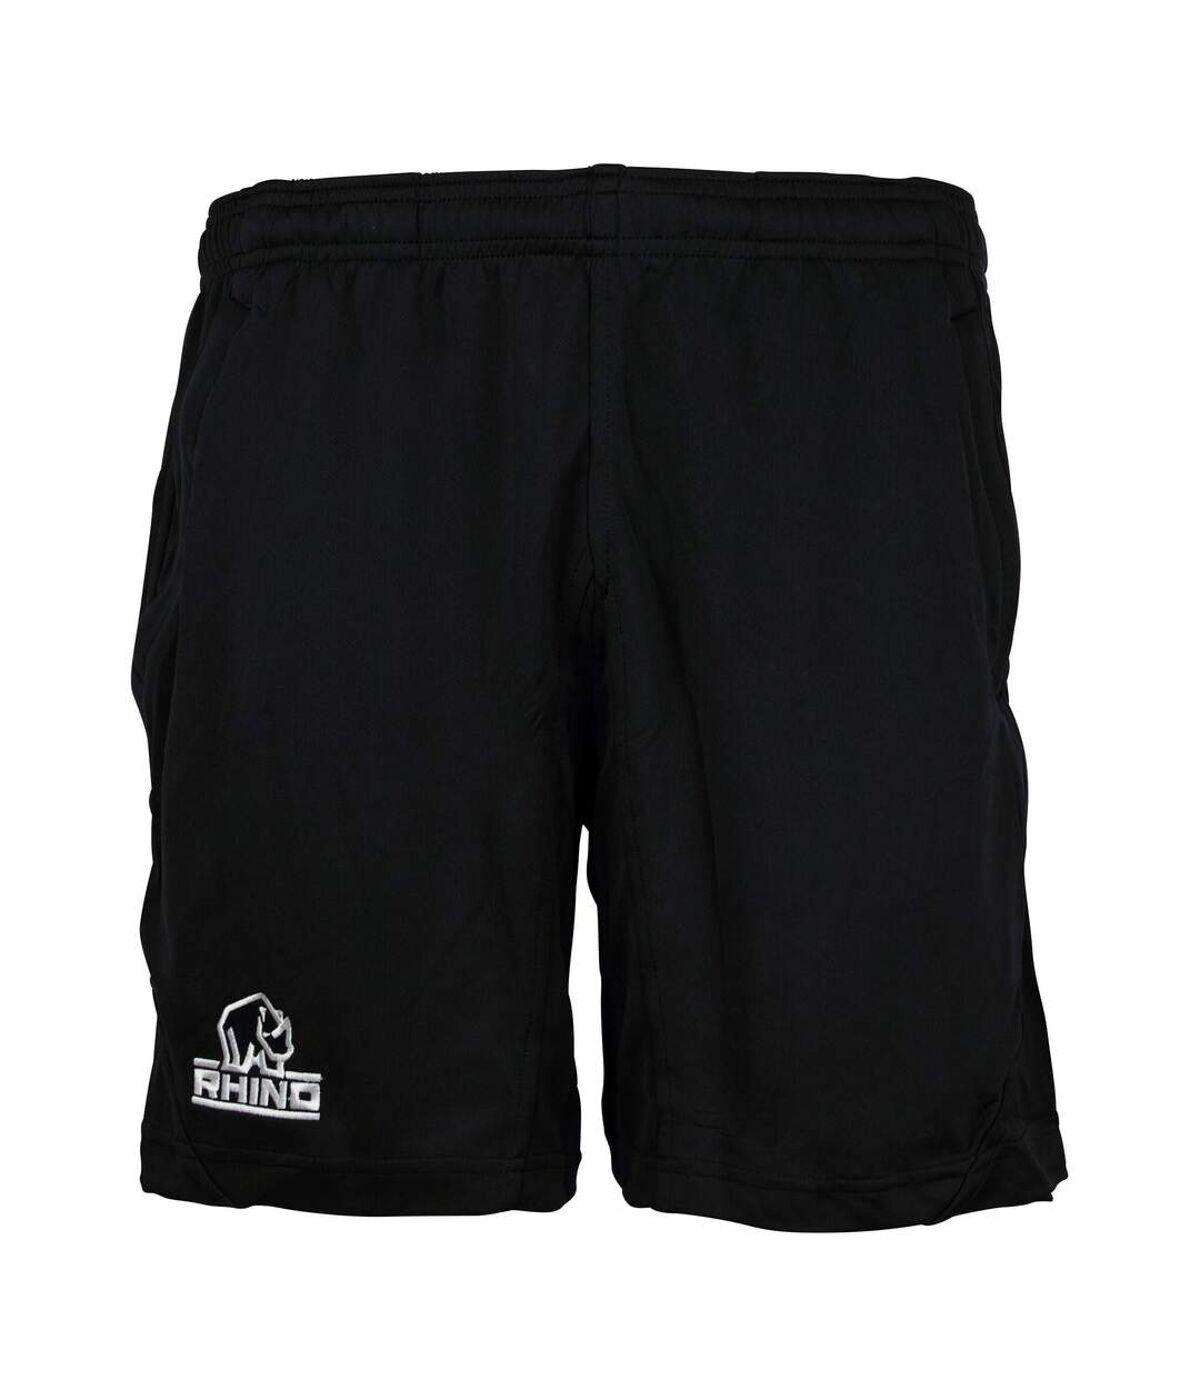 Rhino Mens Challenger Active Shorts (Black) - UTRW7671